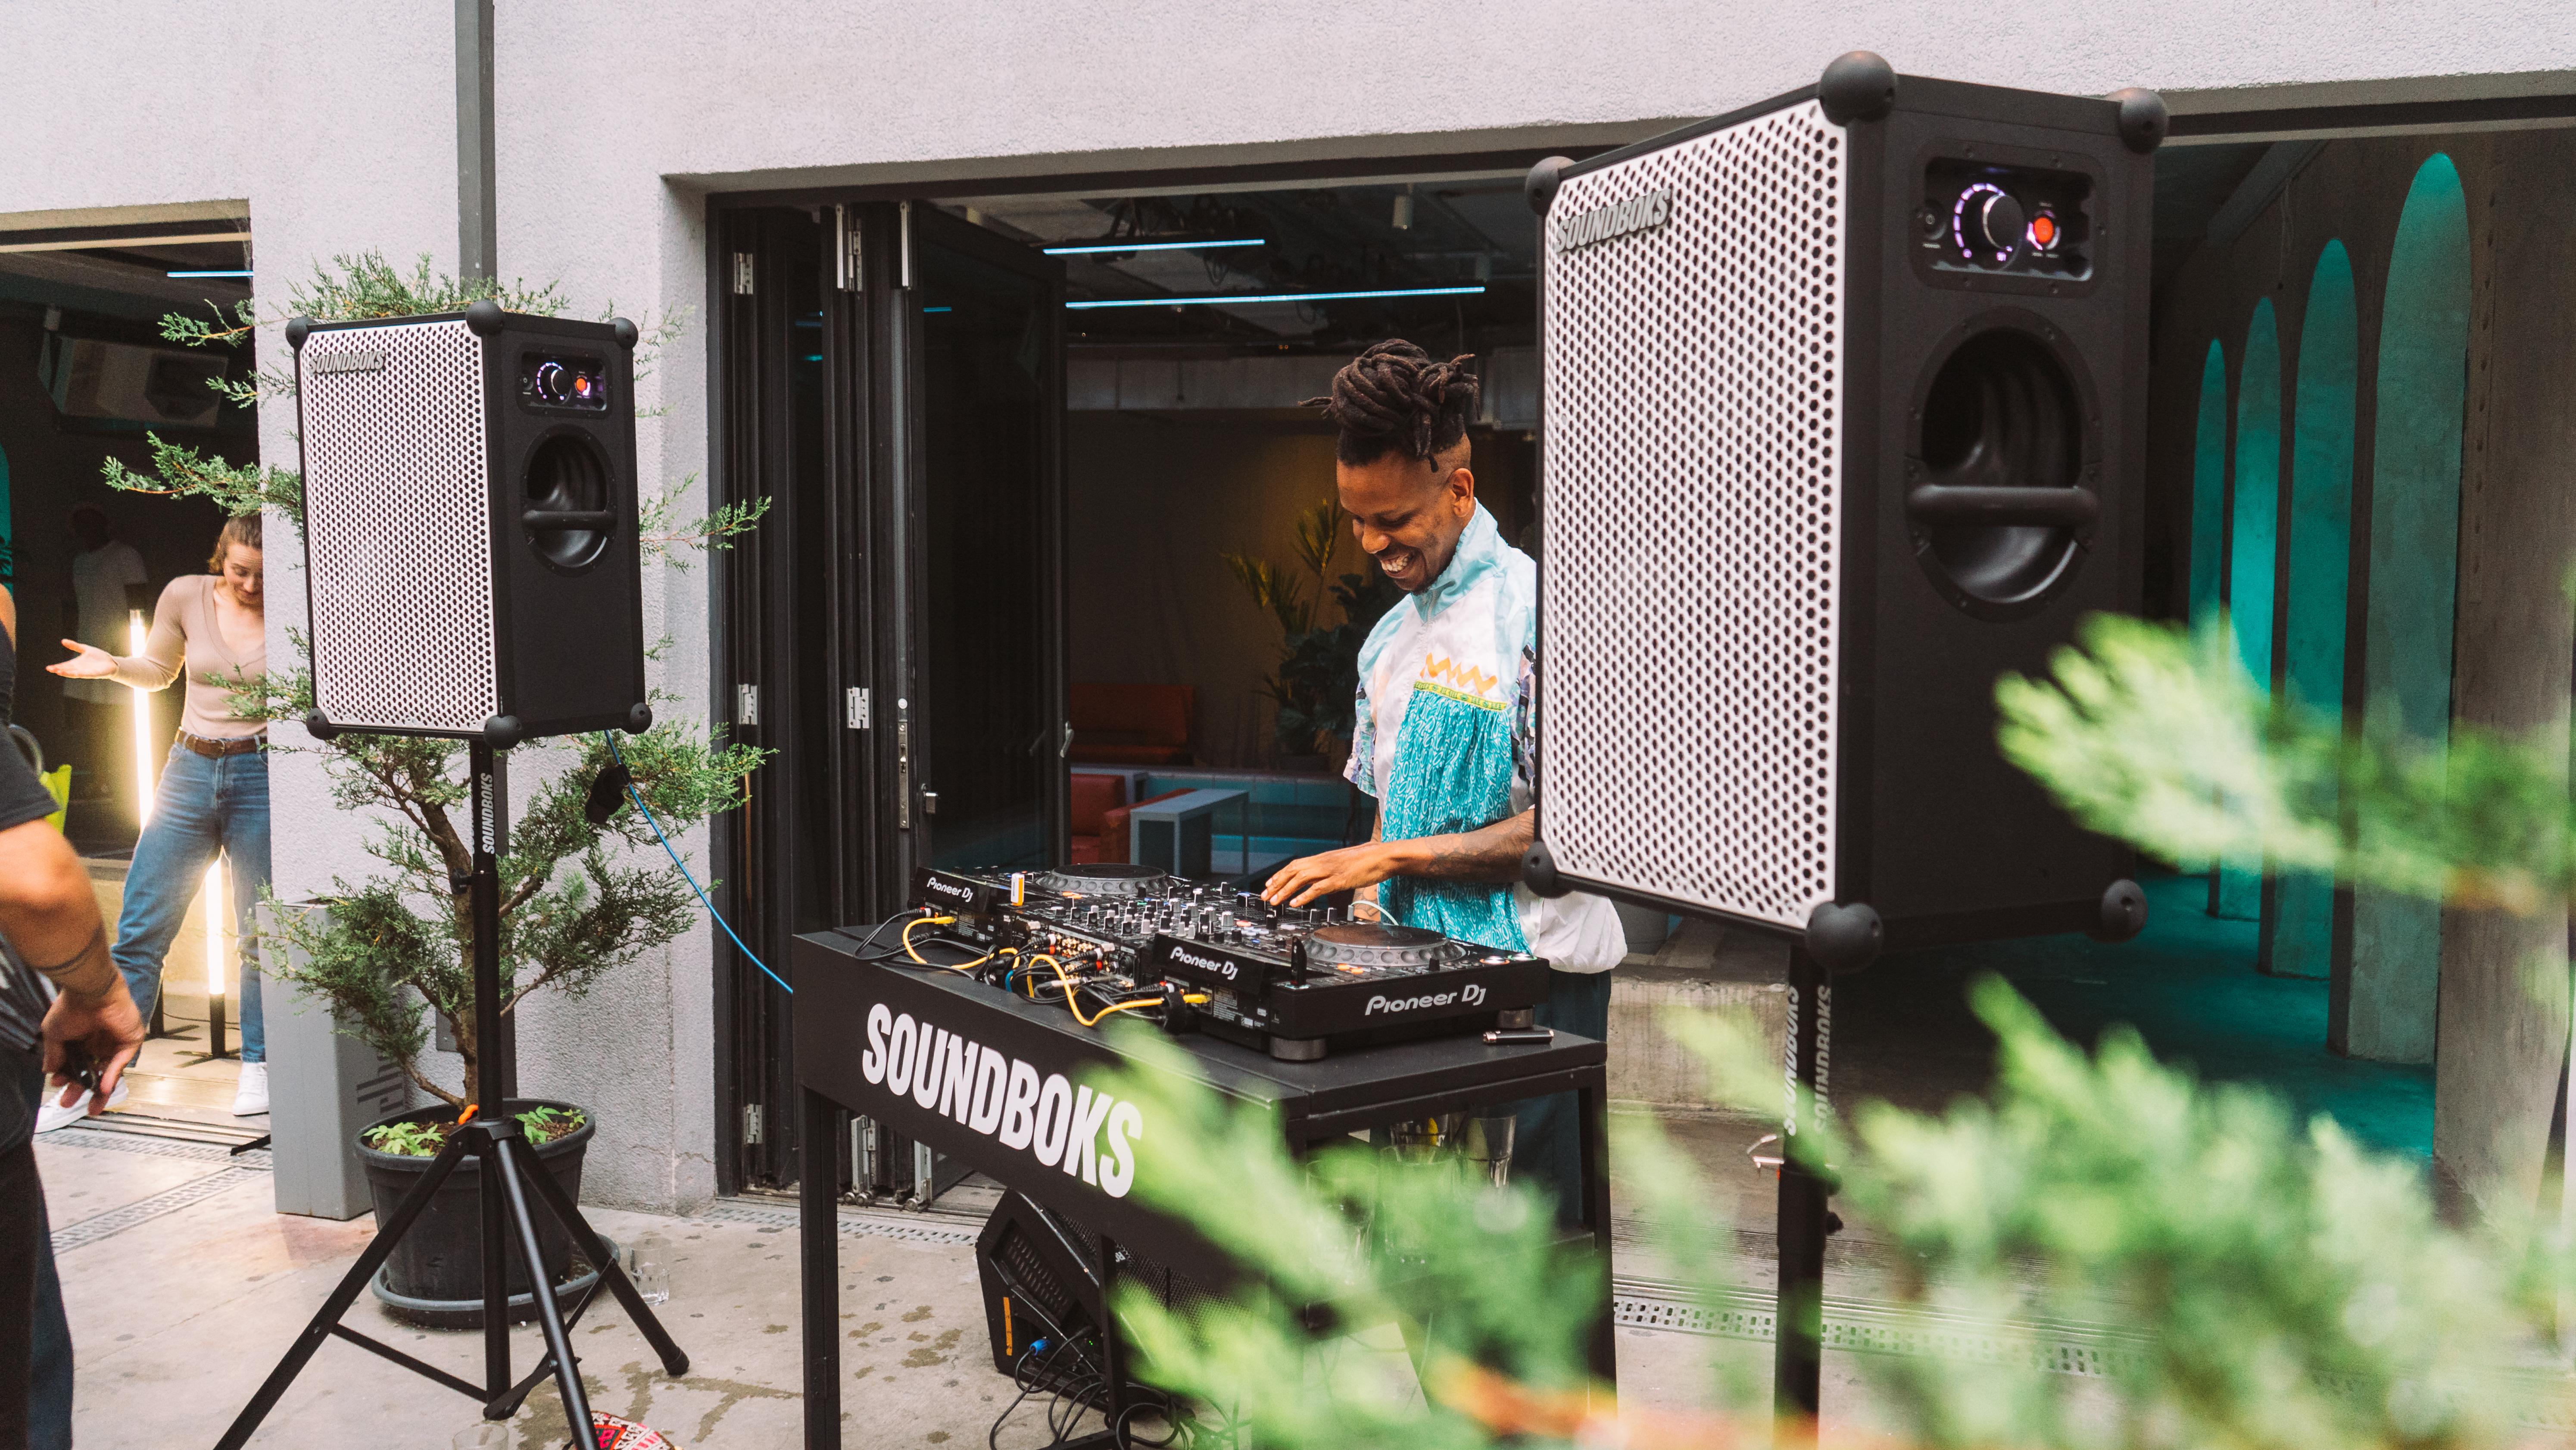 Floyd DJing with SOUNDBOKS